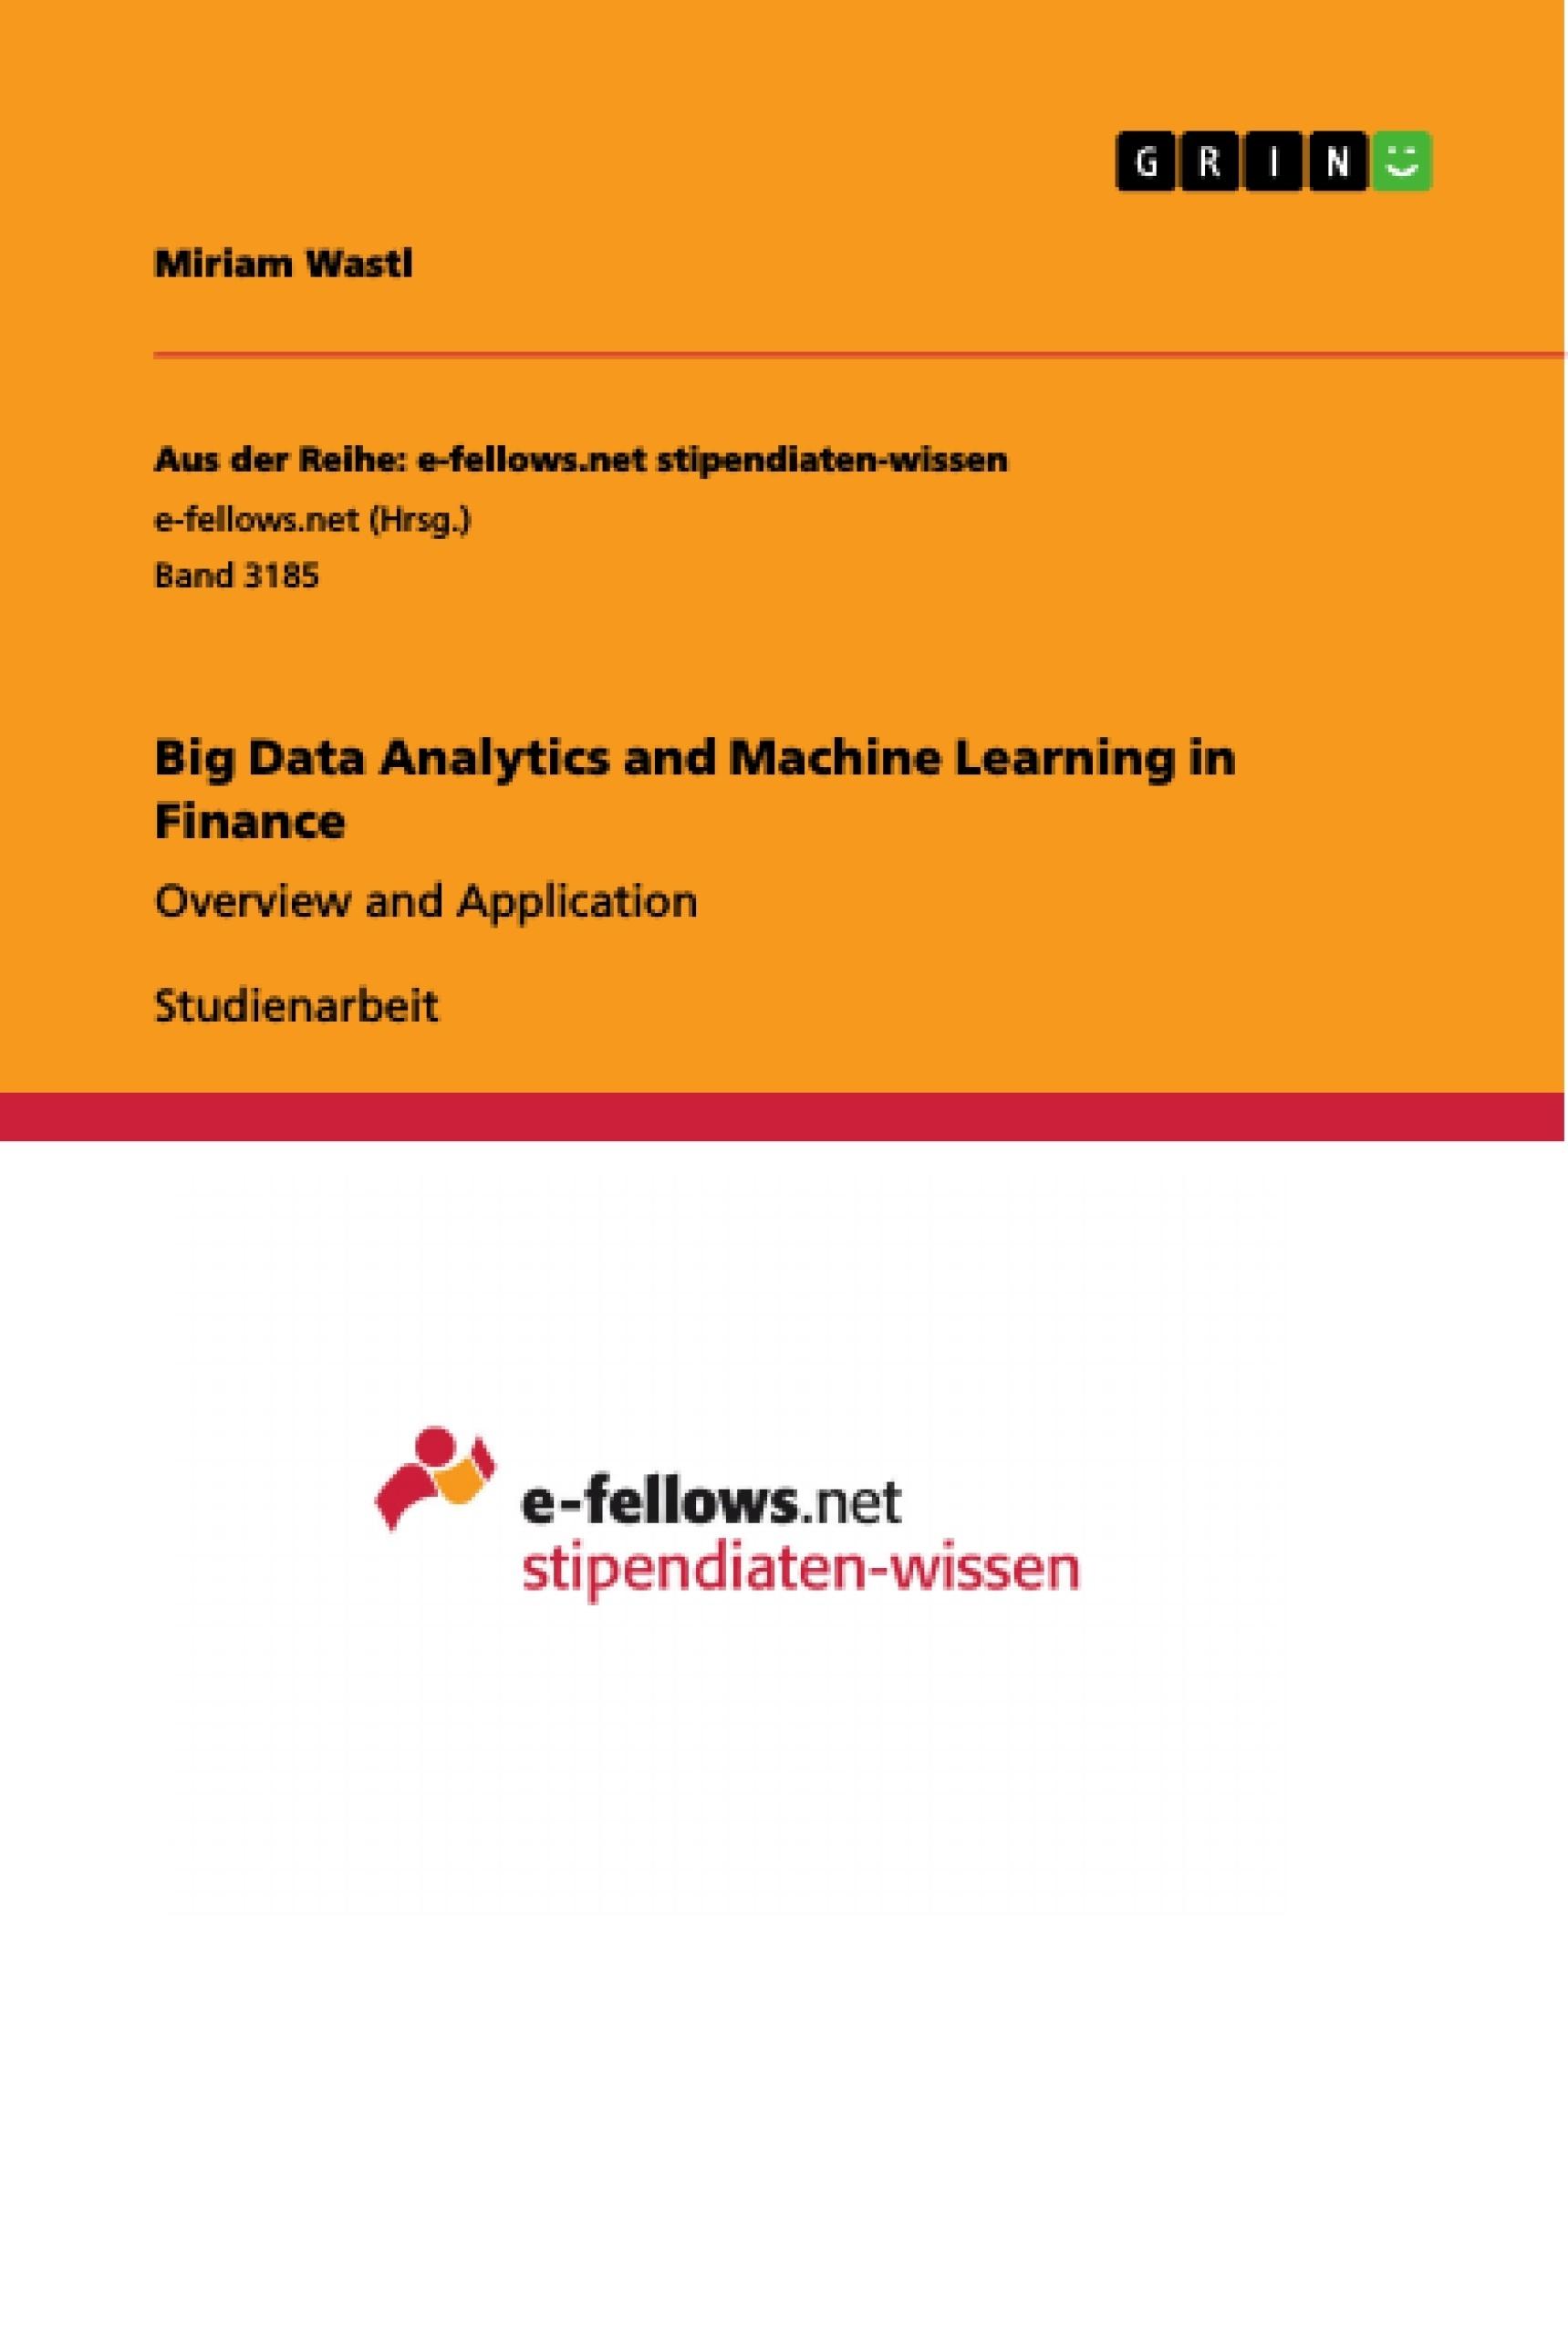 Titel: Big Data Analytics and Machine Learning in Finance